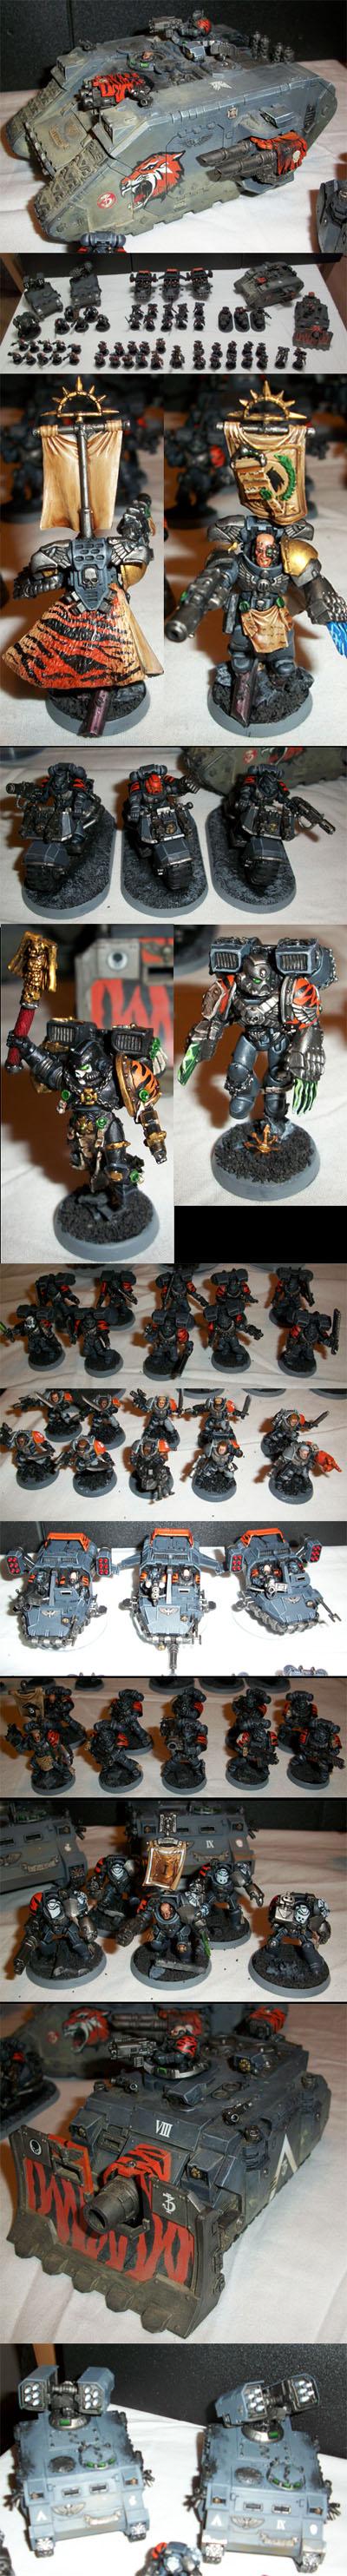 Iron Tigers Space Marine Army